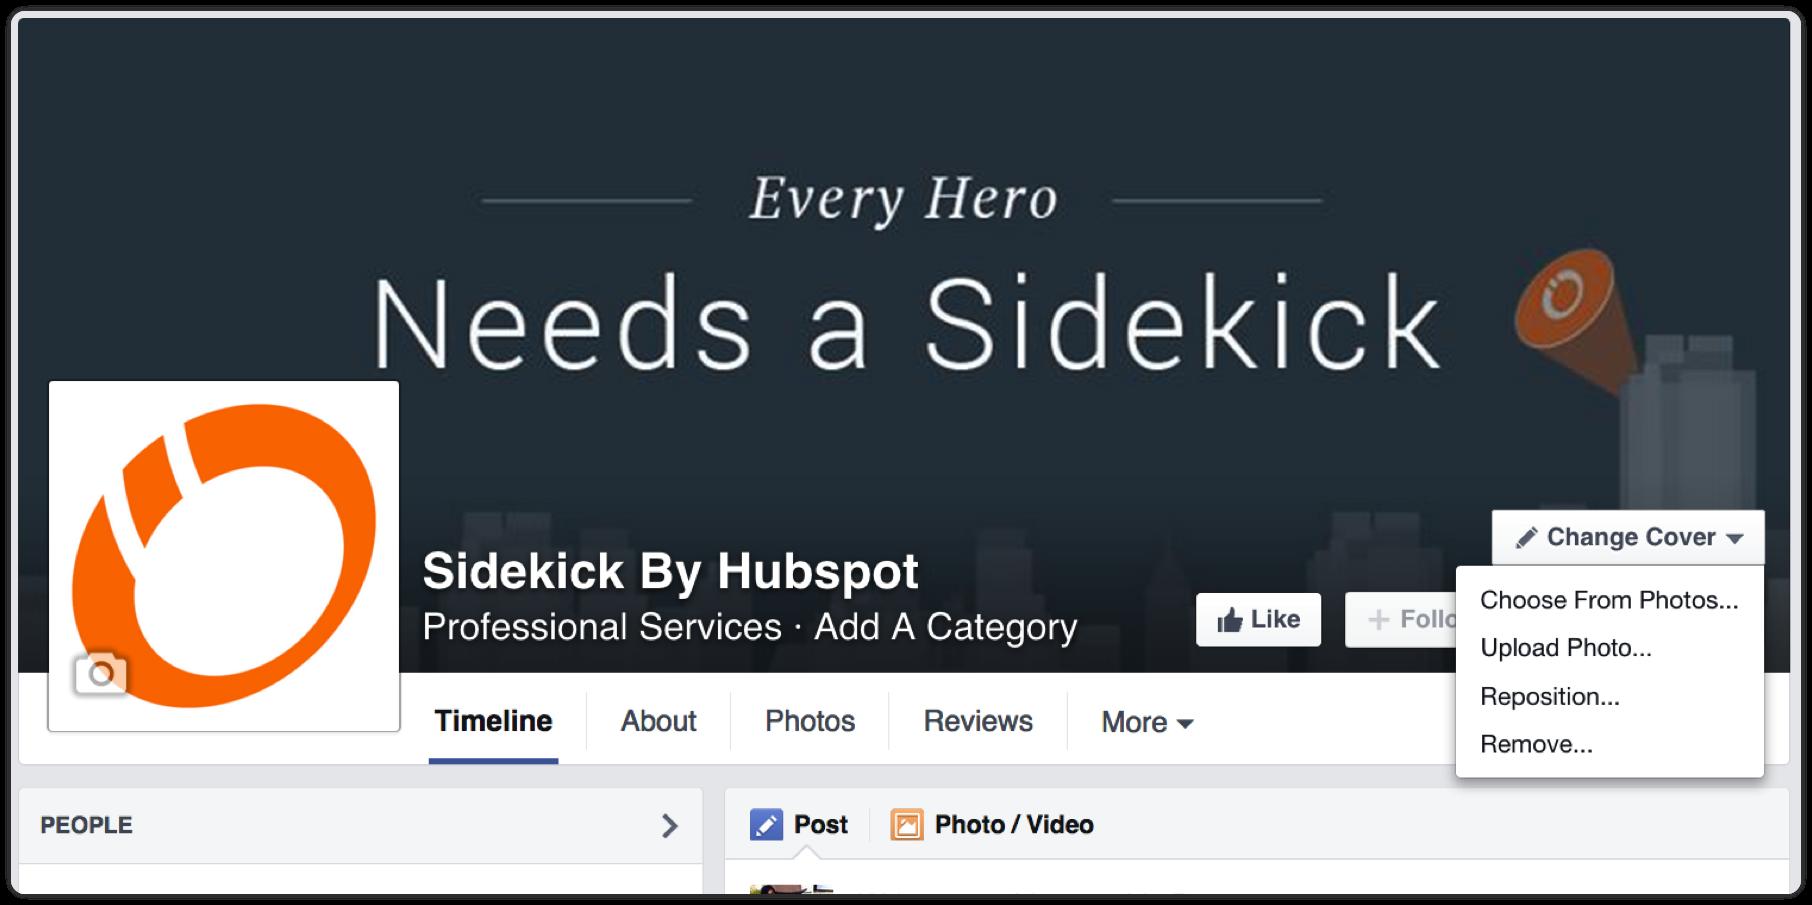 every-hero-needs-sidekick-by-hubspot-facebook-cover-photo